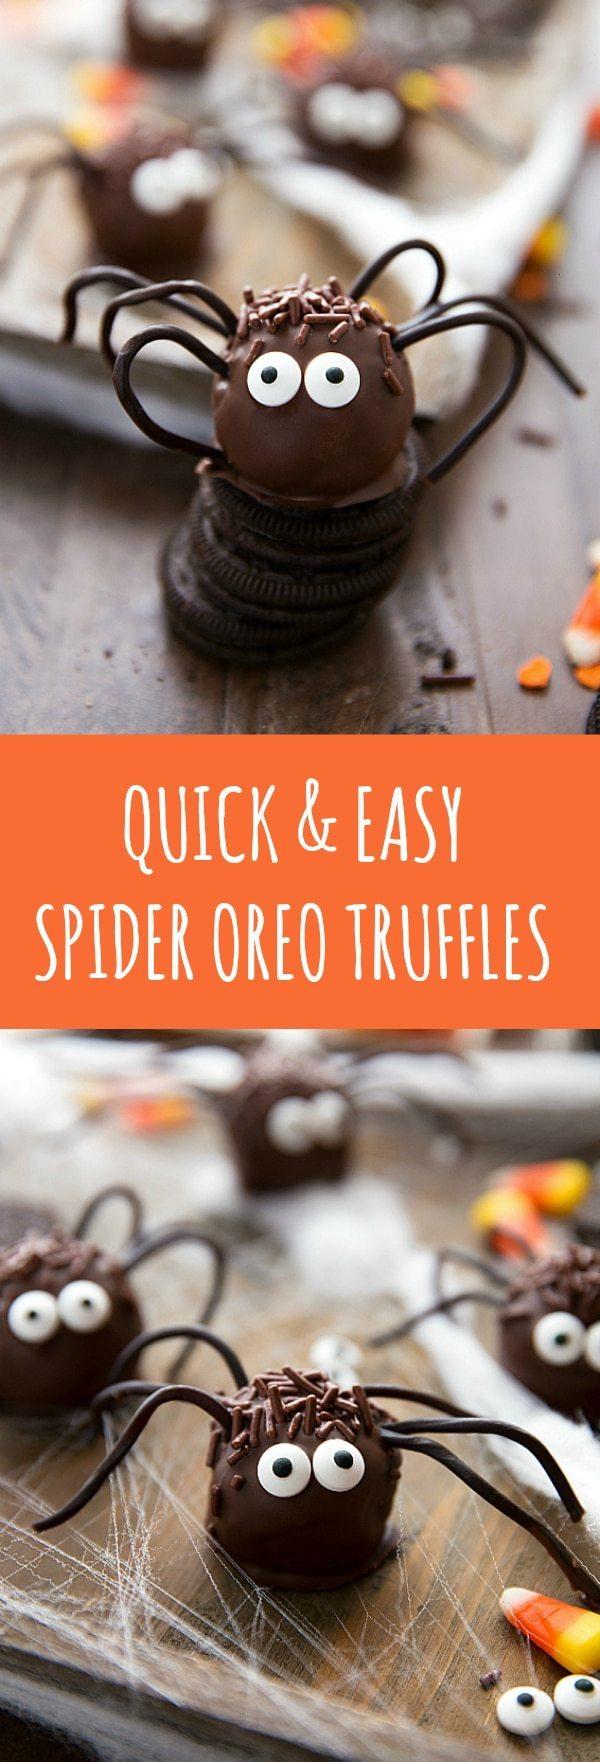 SIMPLE SPIDER OREO TRUFFLES - PERFECT HALLOWEEN TREAT